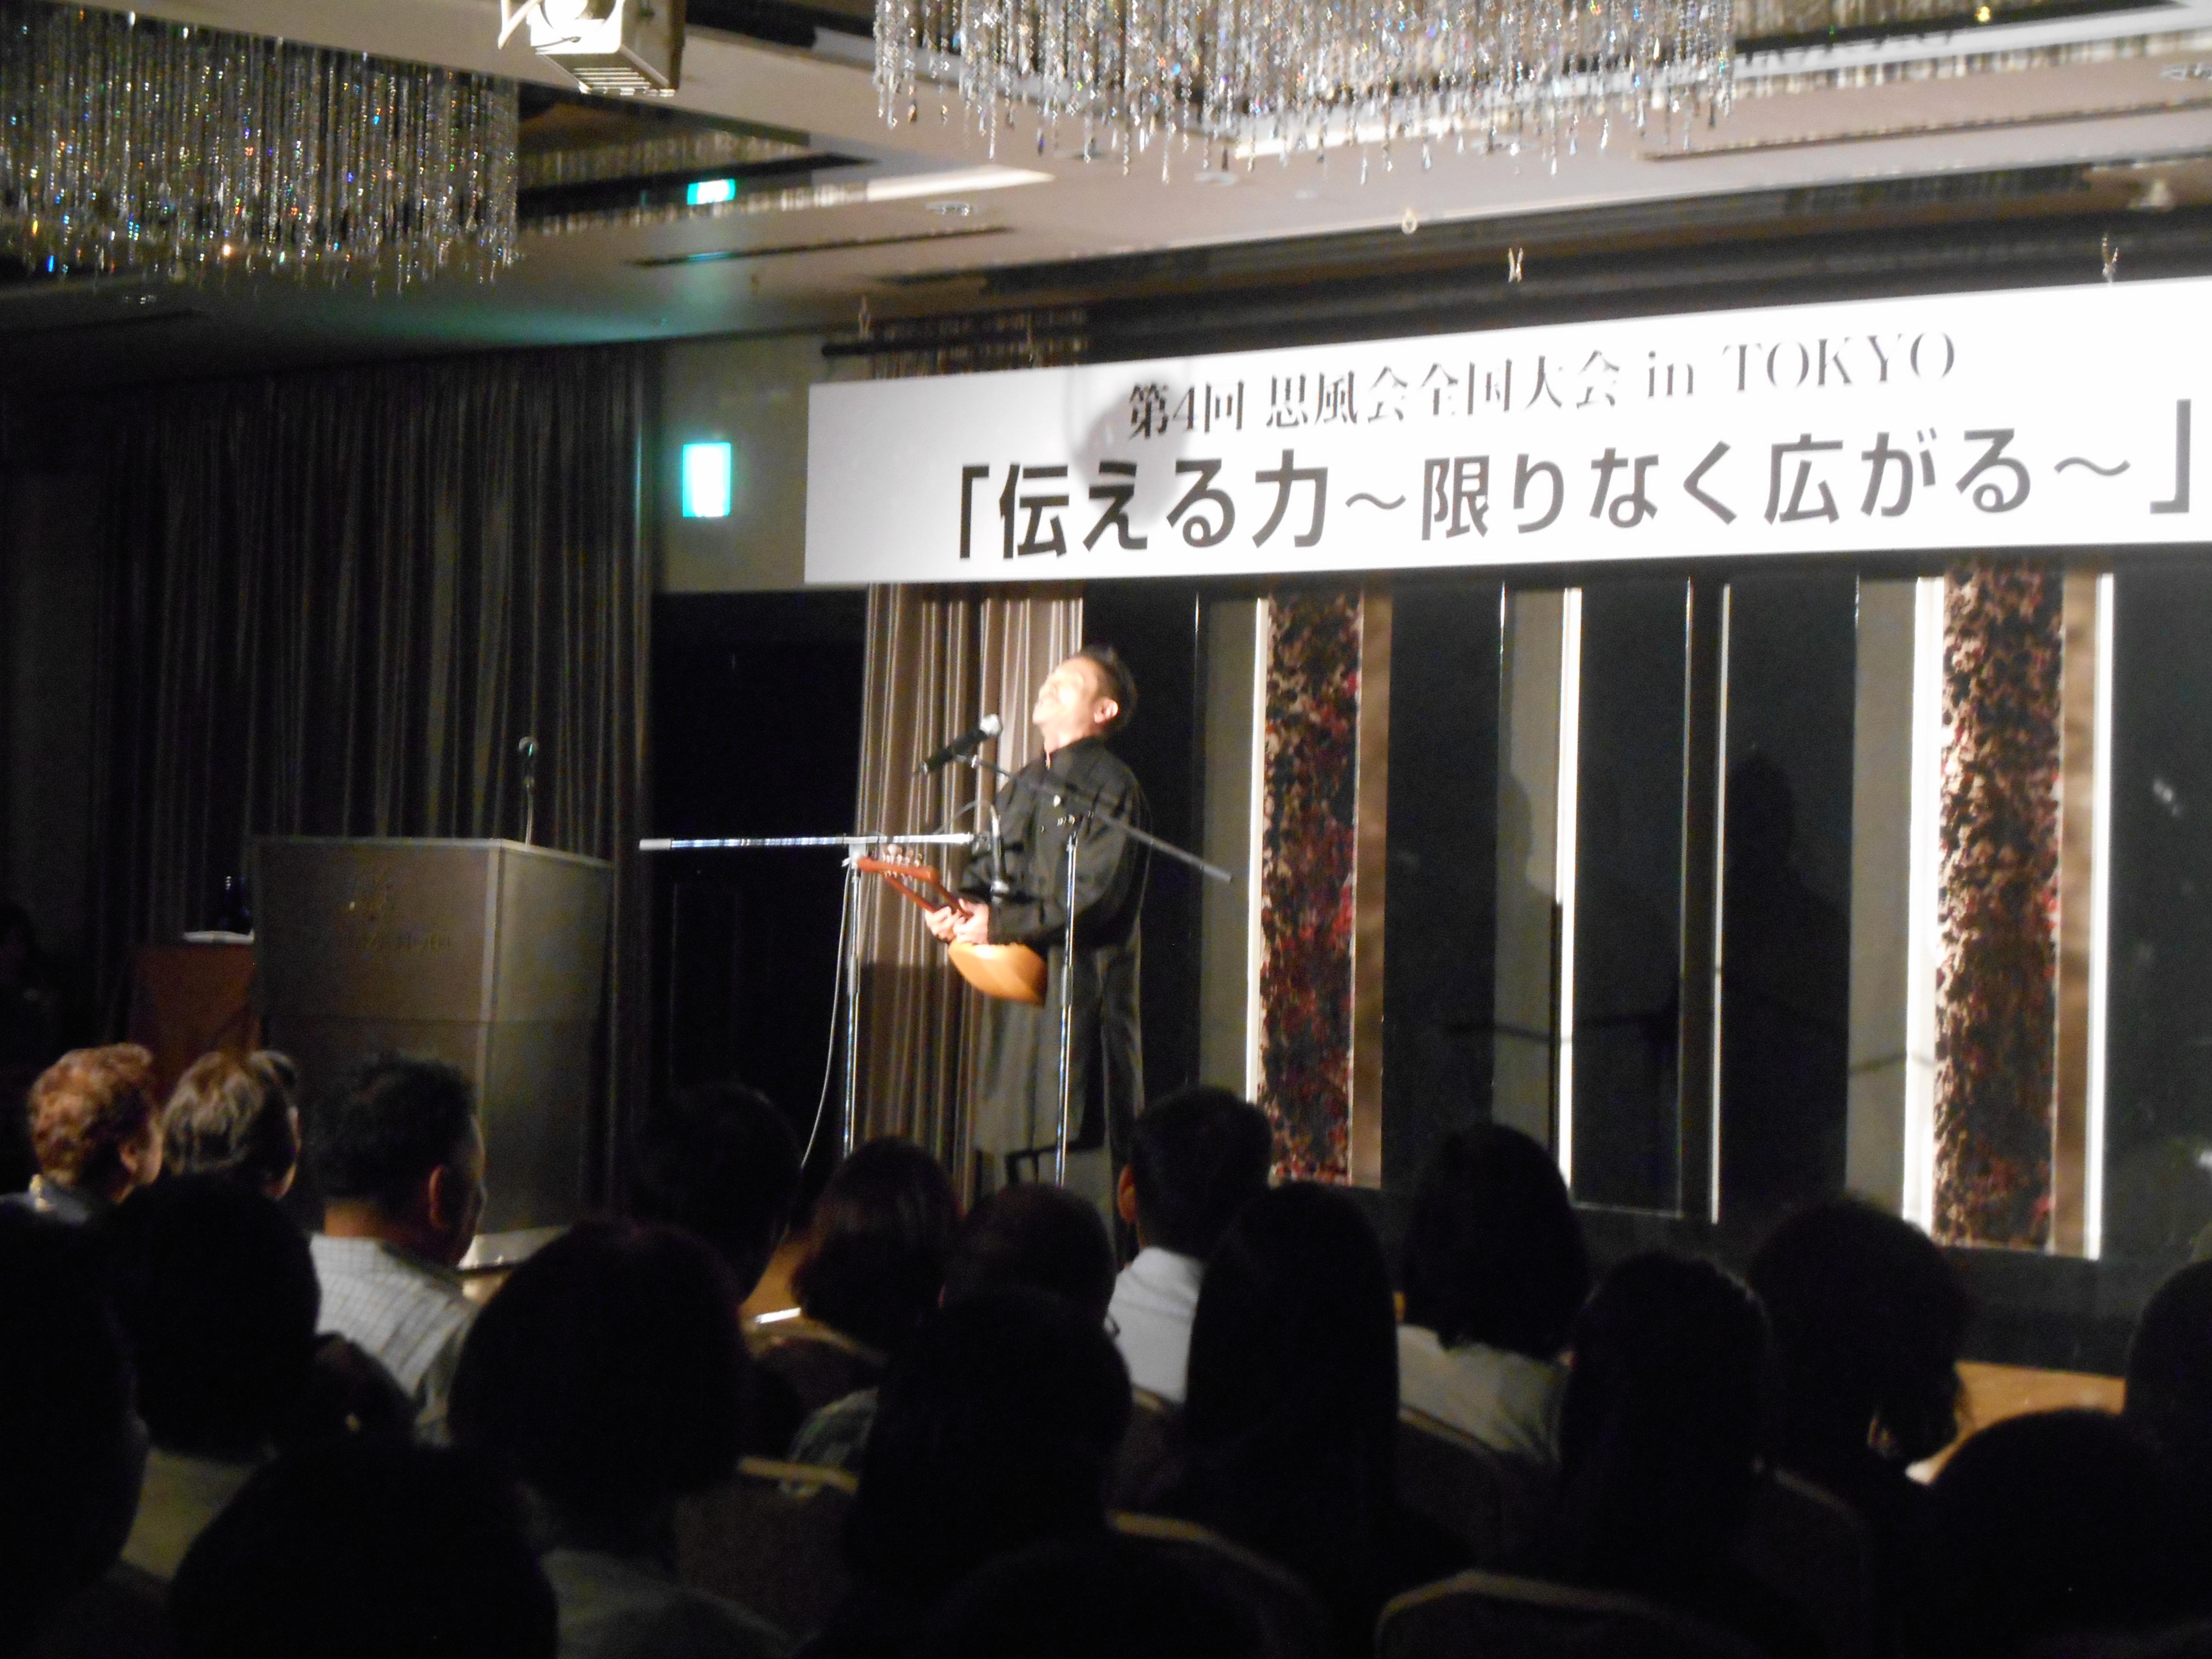 DSCN2046 - 平成30年度 東京思風塾 4月7日(土)「時代が問題をつくり、問題が人物をつくる」